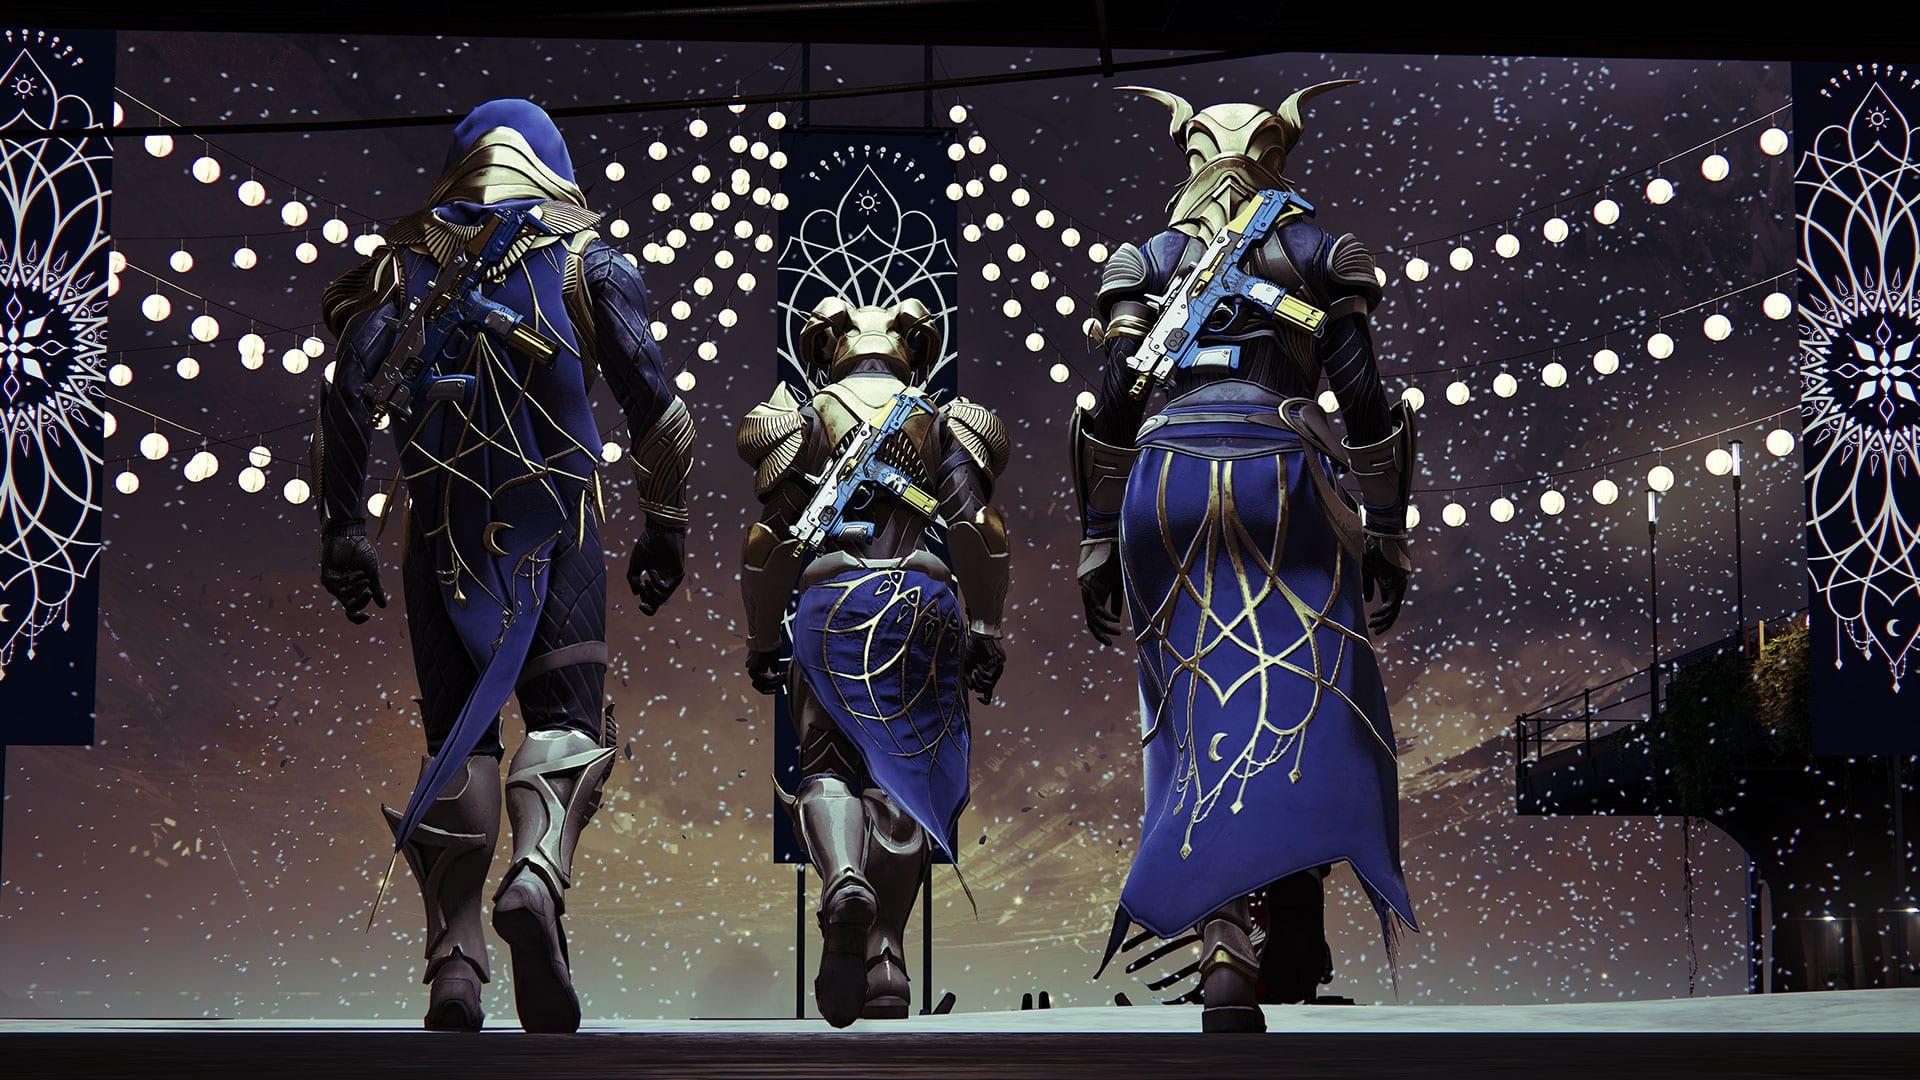 dark ether cane, destiny 2, dawning